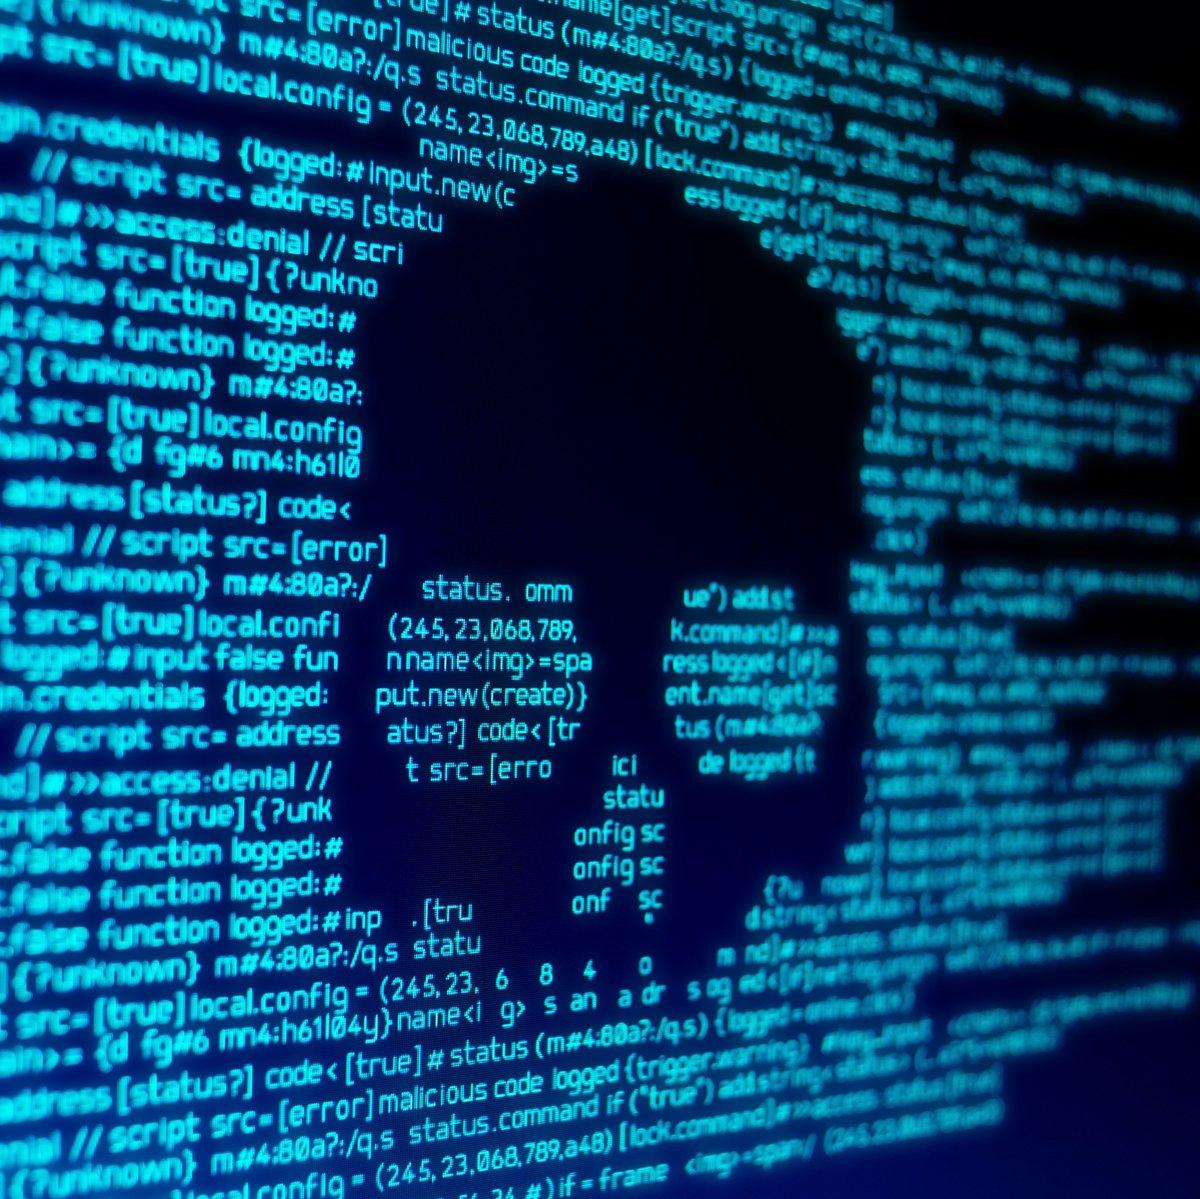 Fotolia hacker virus code_cropped_4006x4003_cropped_4006x4003_cropped_4000x3997_cropped_0x0